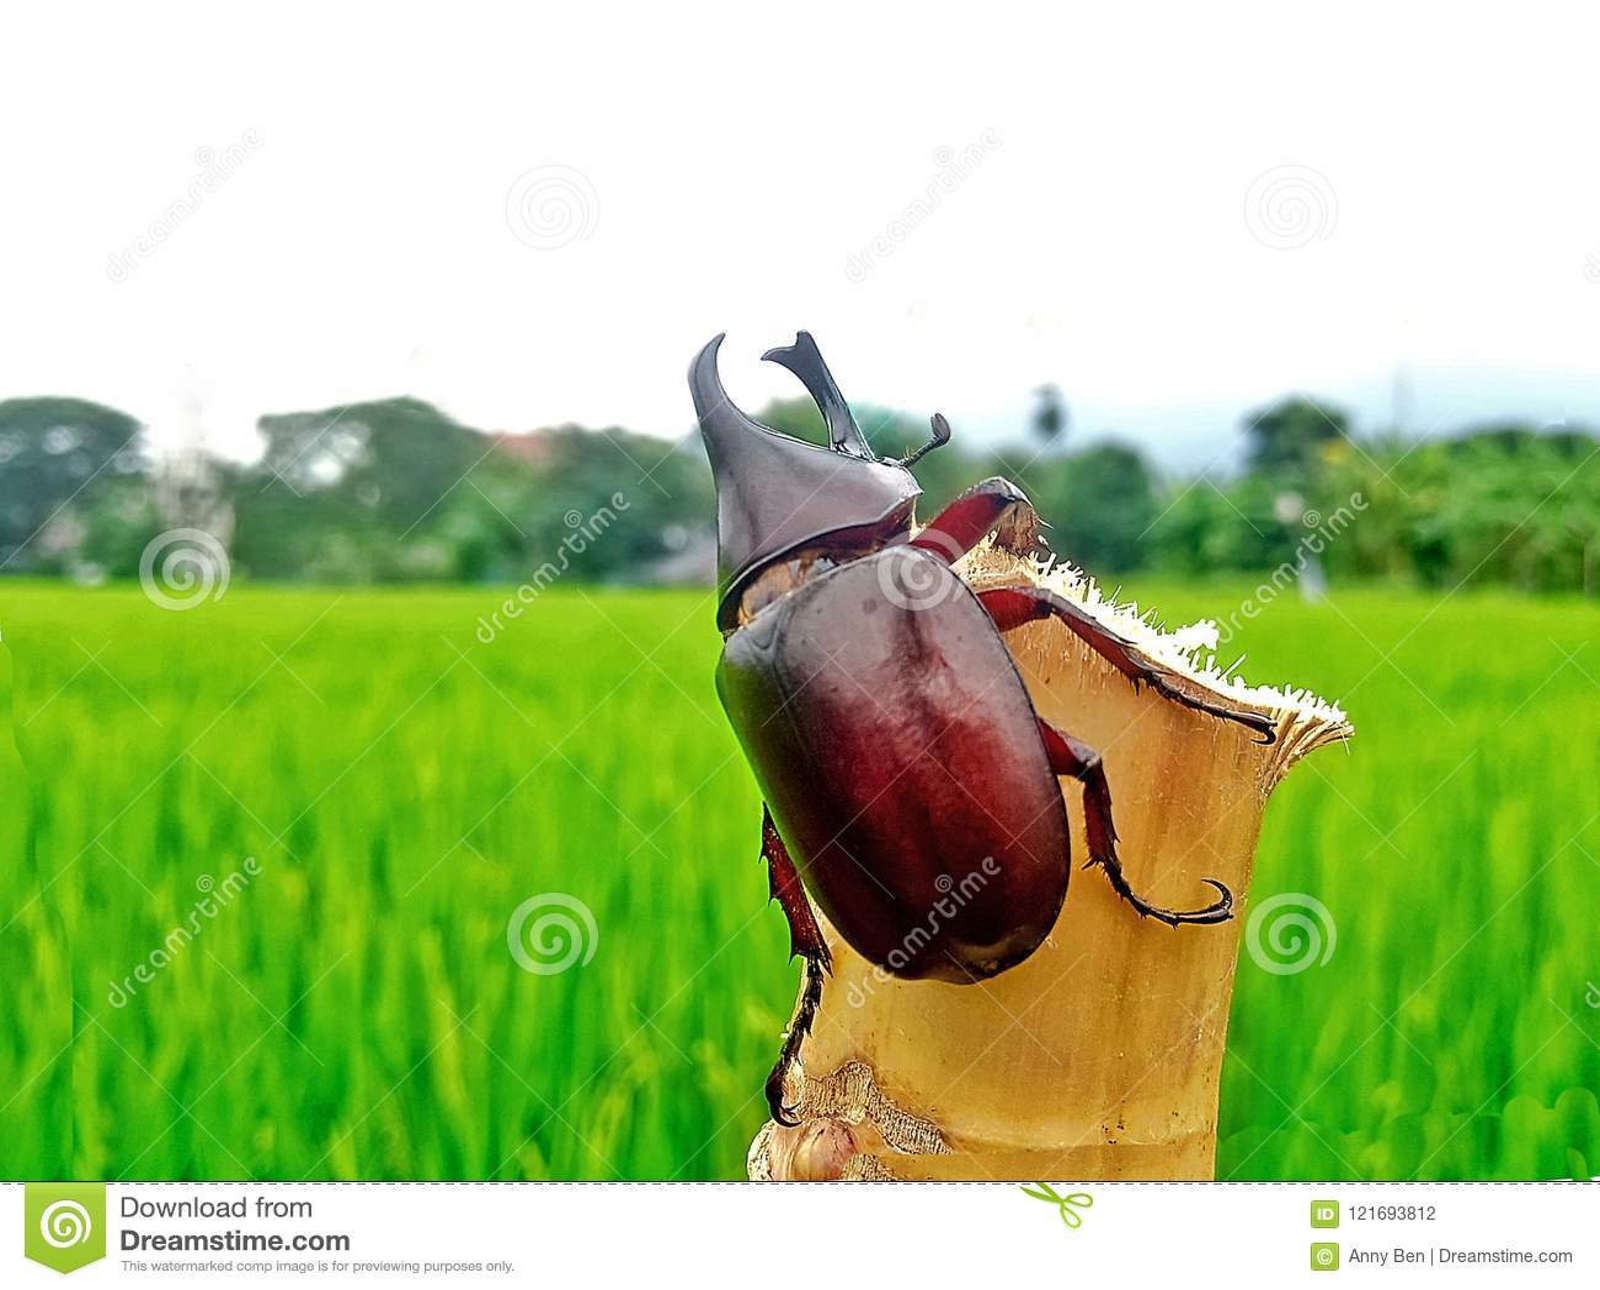 Nosorożec ściga, nosorożec ściga na bambusie